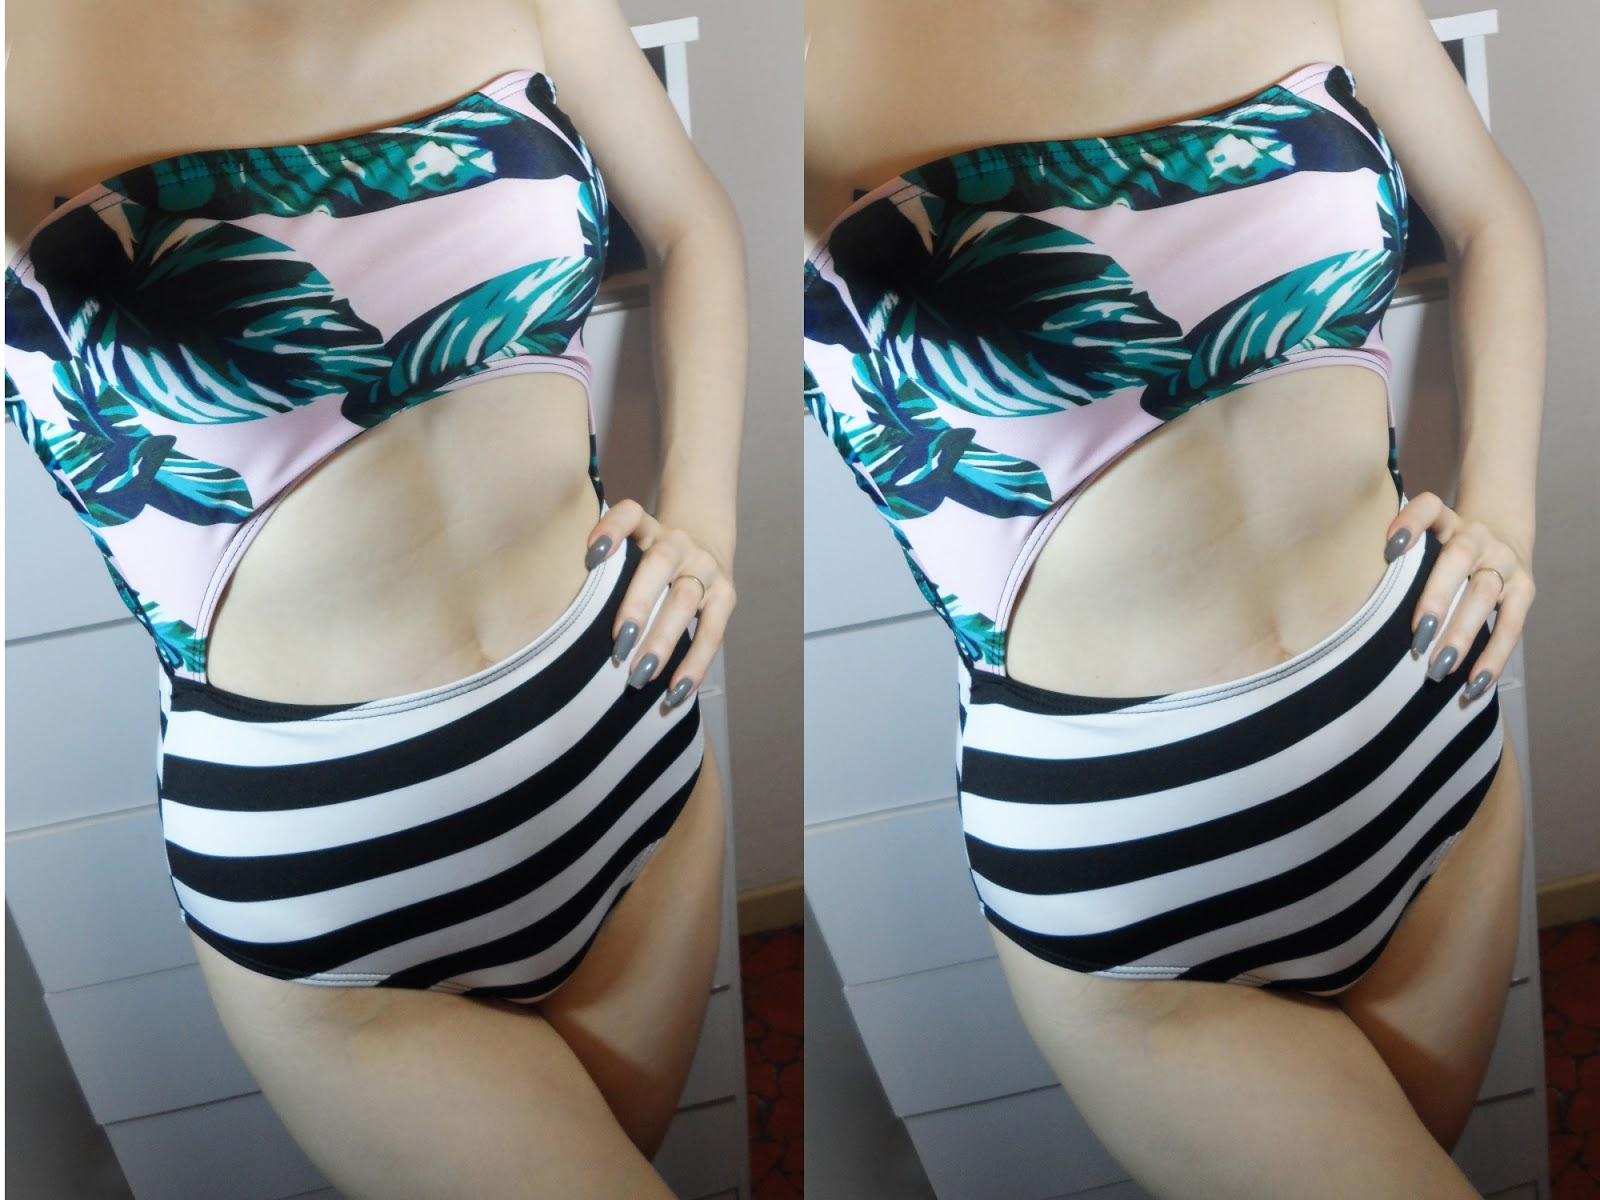 summer swimsuit monokini trend zaful blogger review try on haul liz breygel